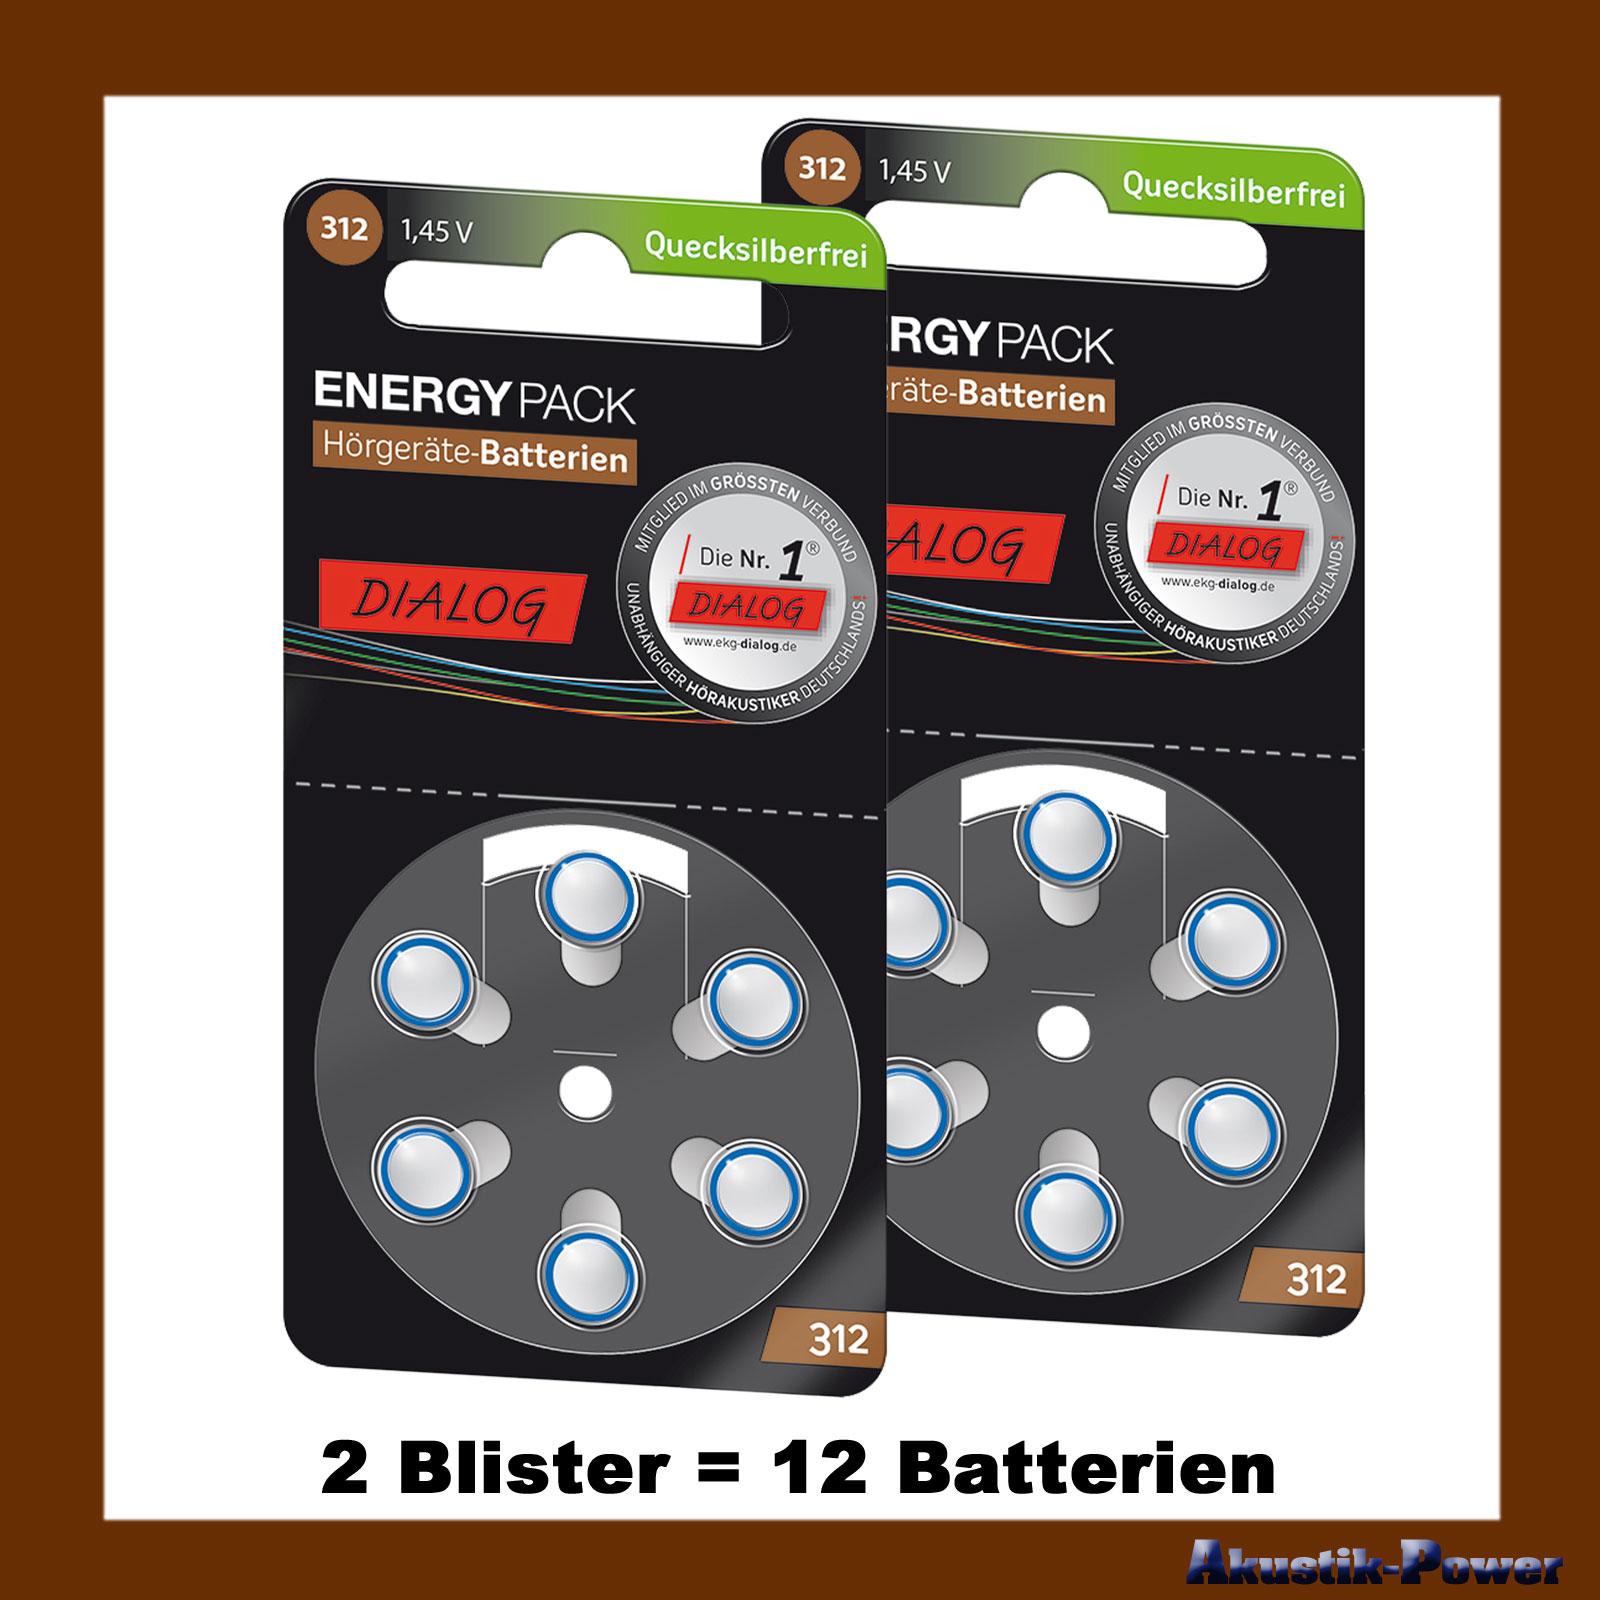 akustik power energy pack typ 312 pr41 a312 h rger te batterien 12 batterien 6 29 online. Black Bedroom Furniture Sets. Home Design Ideas